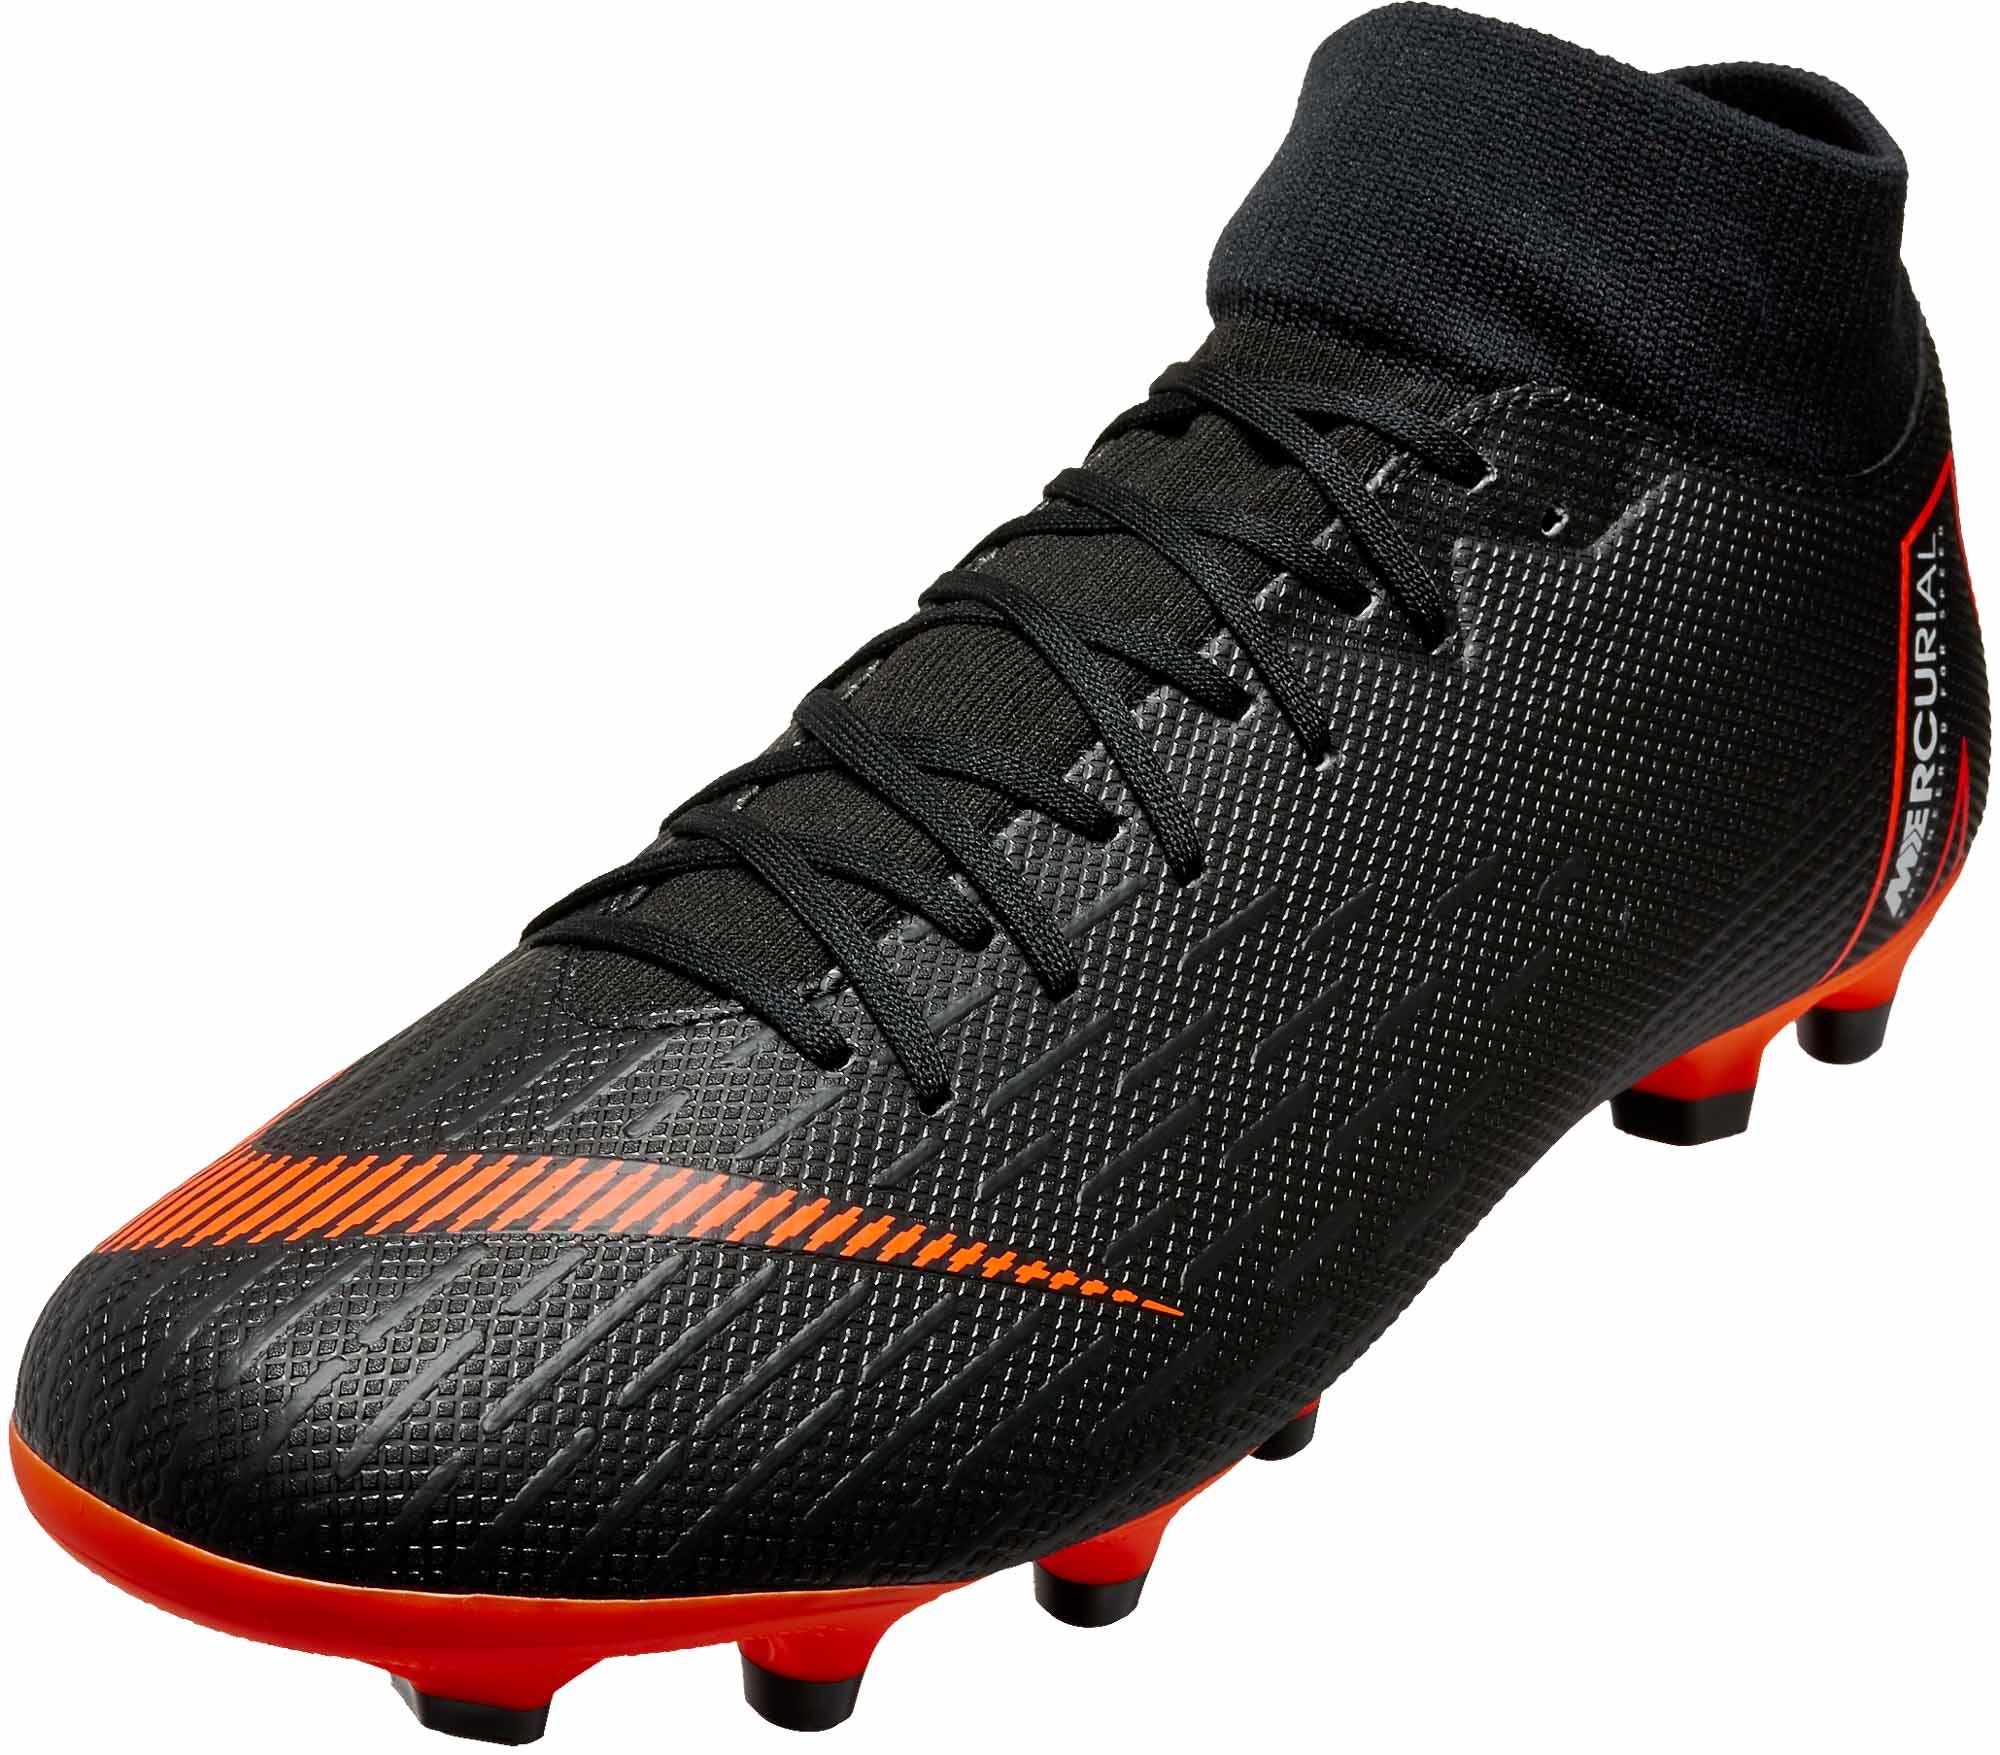 Nike Superfly 6 Academy MG - Black